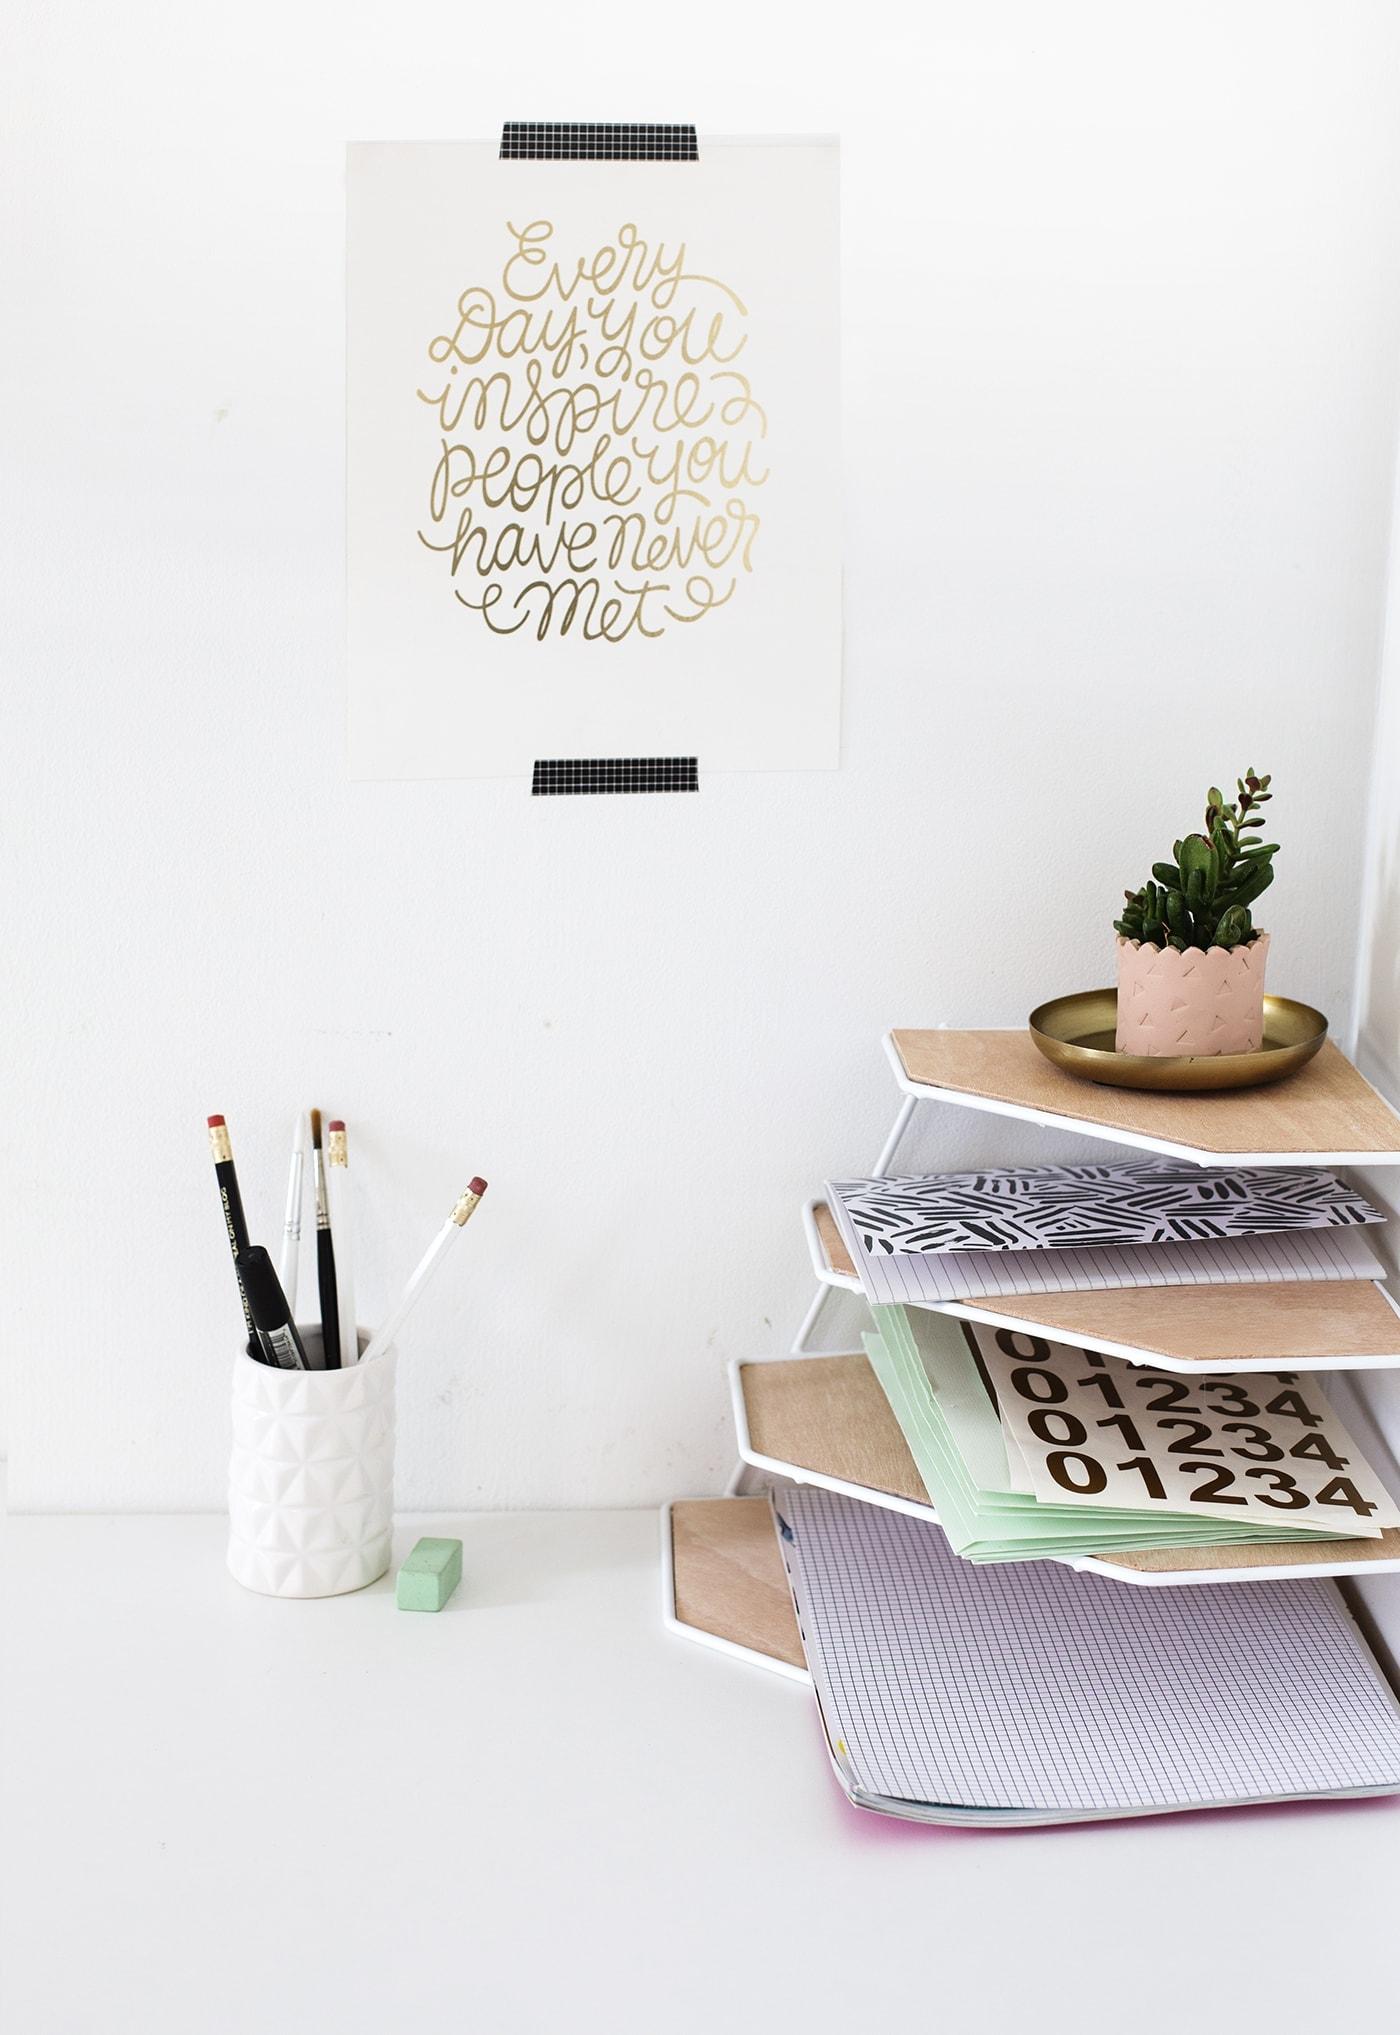 DIY balsa wood desk organiser | workspace tidy up | easy craft ideas